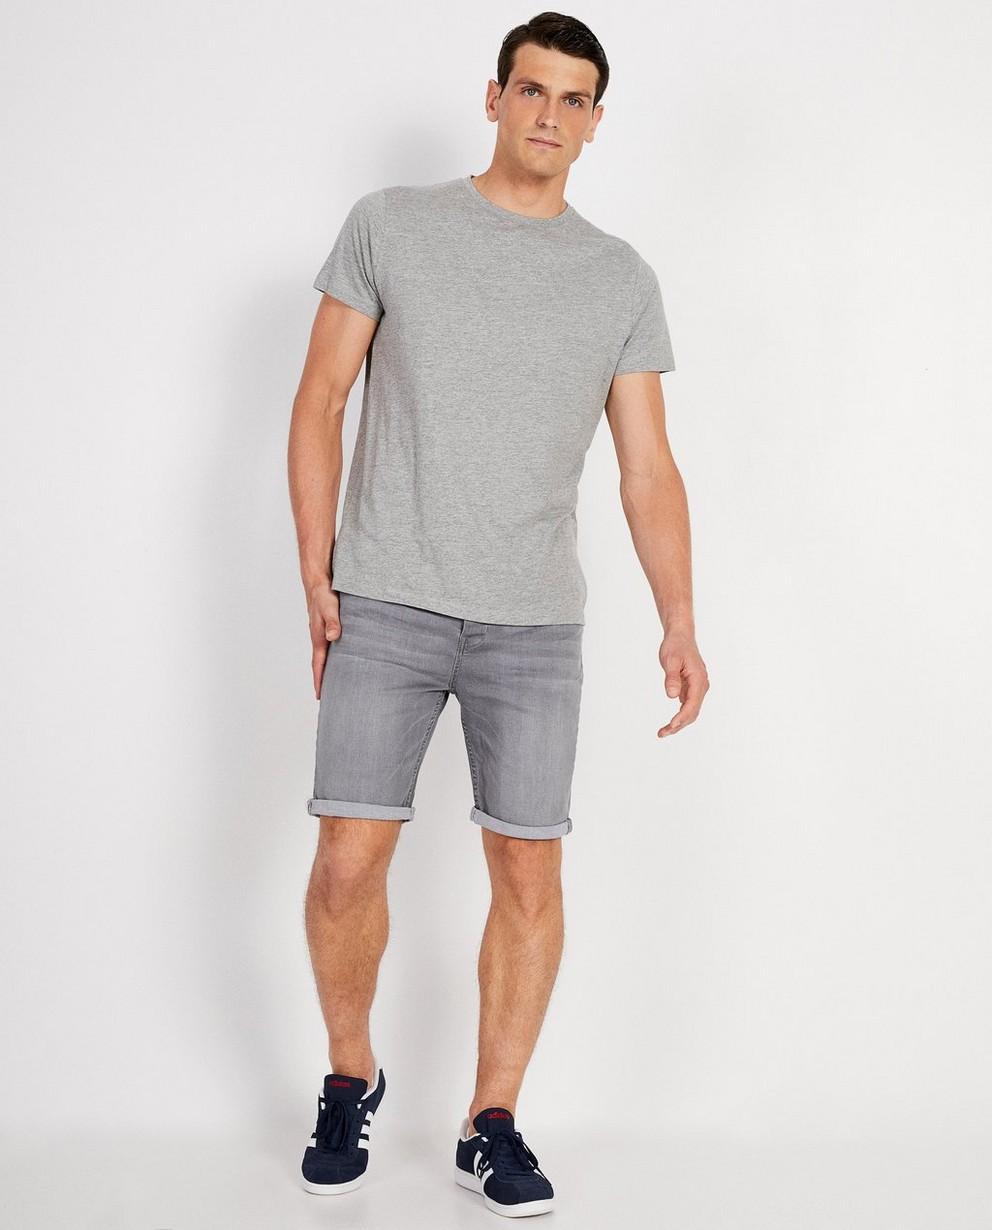 Blauwe short - jeans - JBC